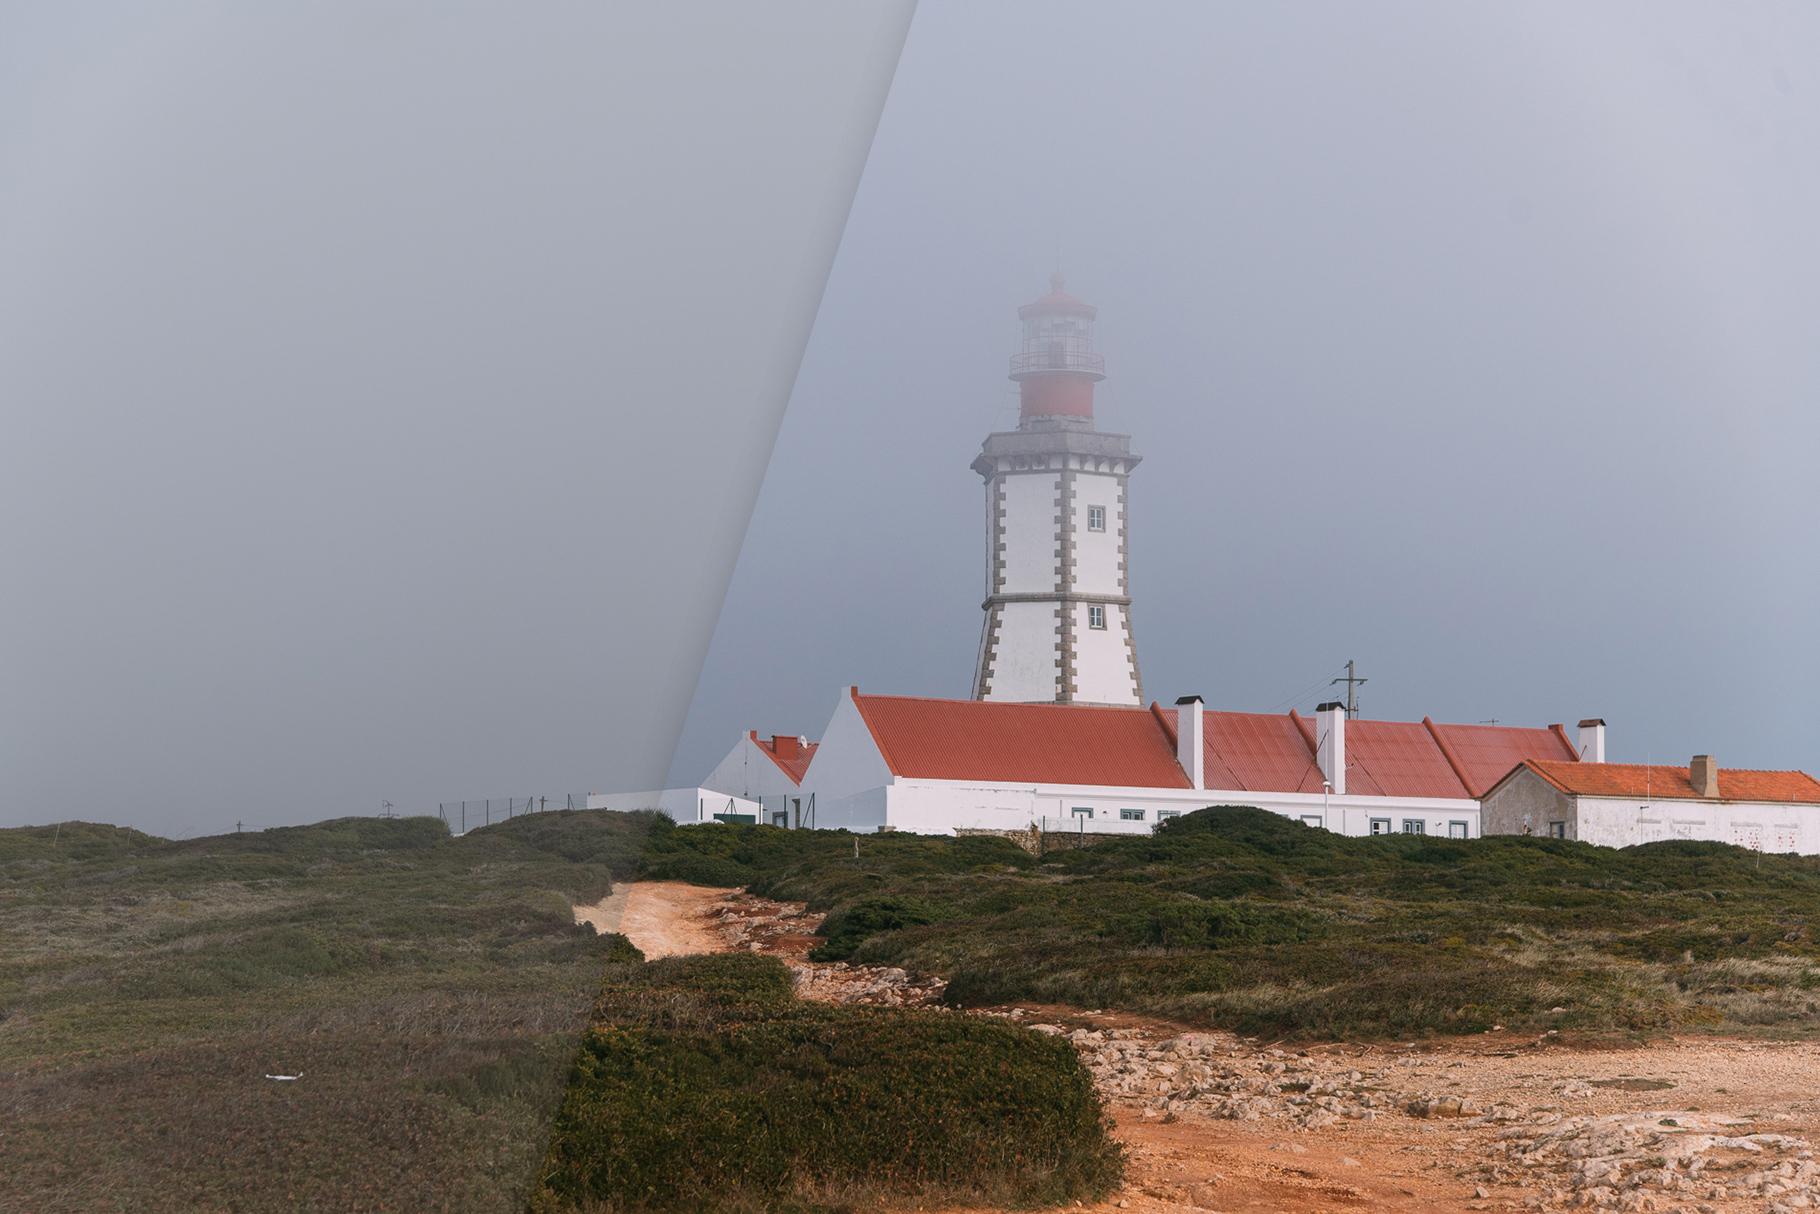 Best Lightroom Presets for Travel & Landscape Photography example image 12